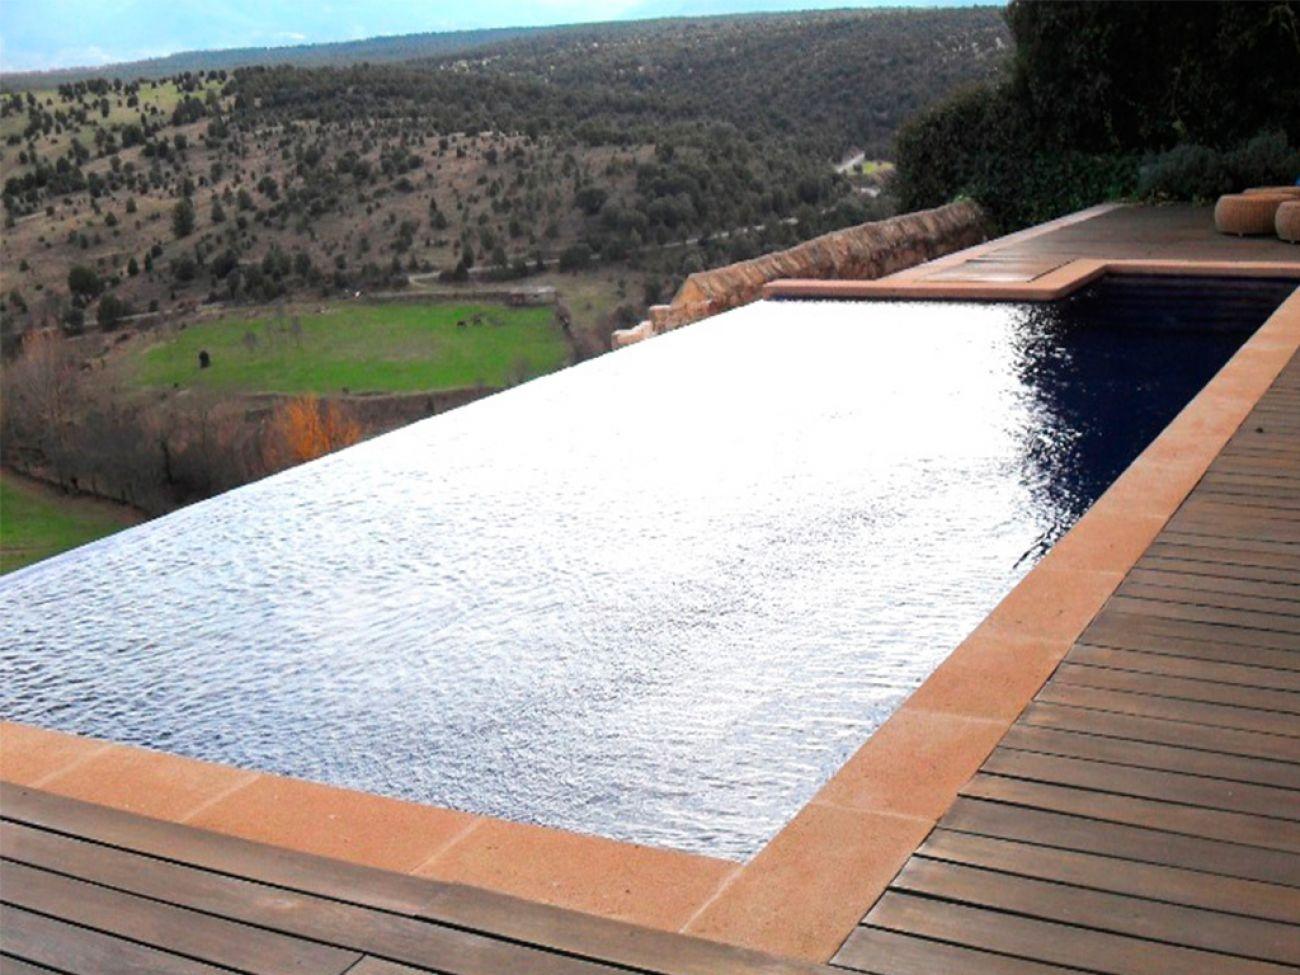 Construcci n de piscina infinity en segovia pedraza - Construccion de piscina ...